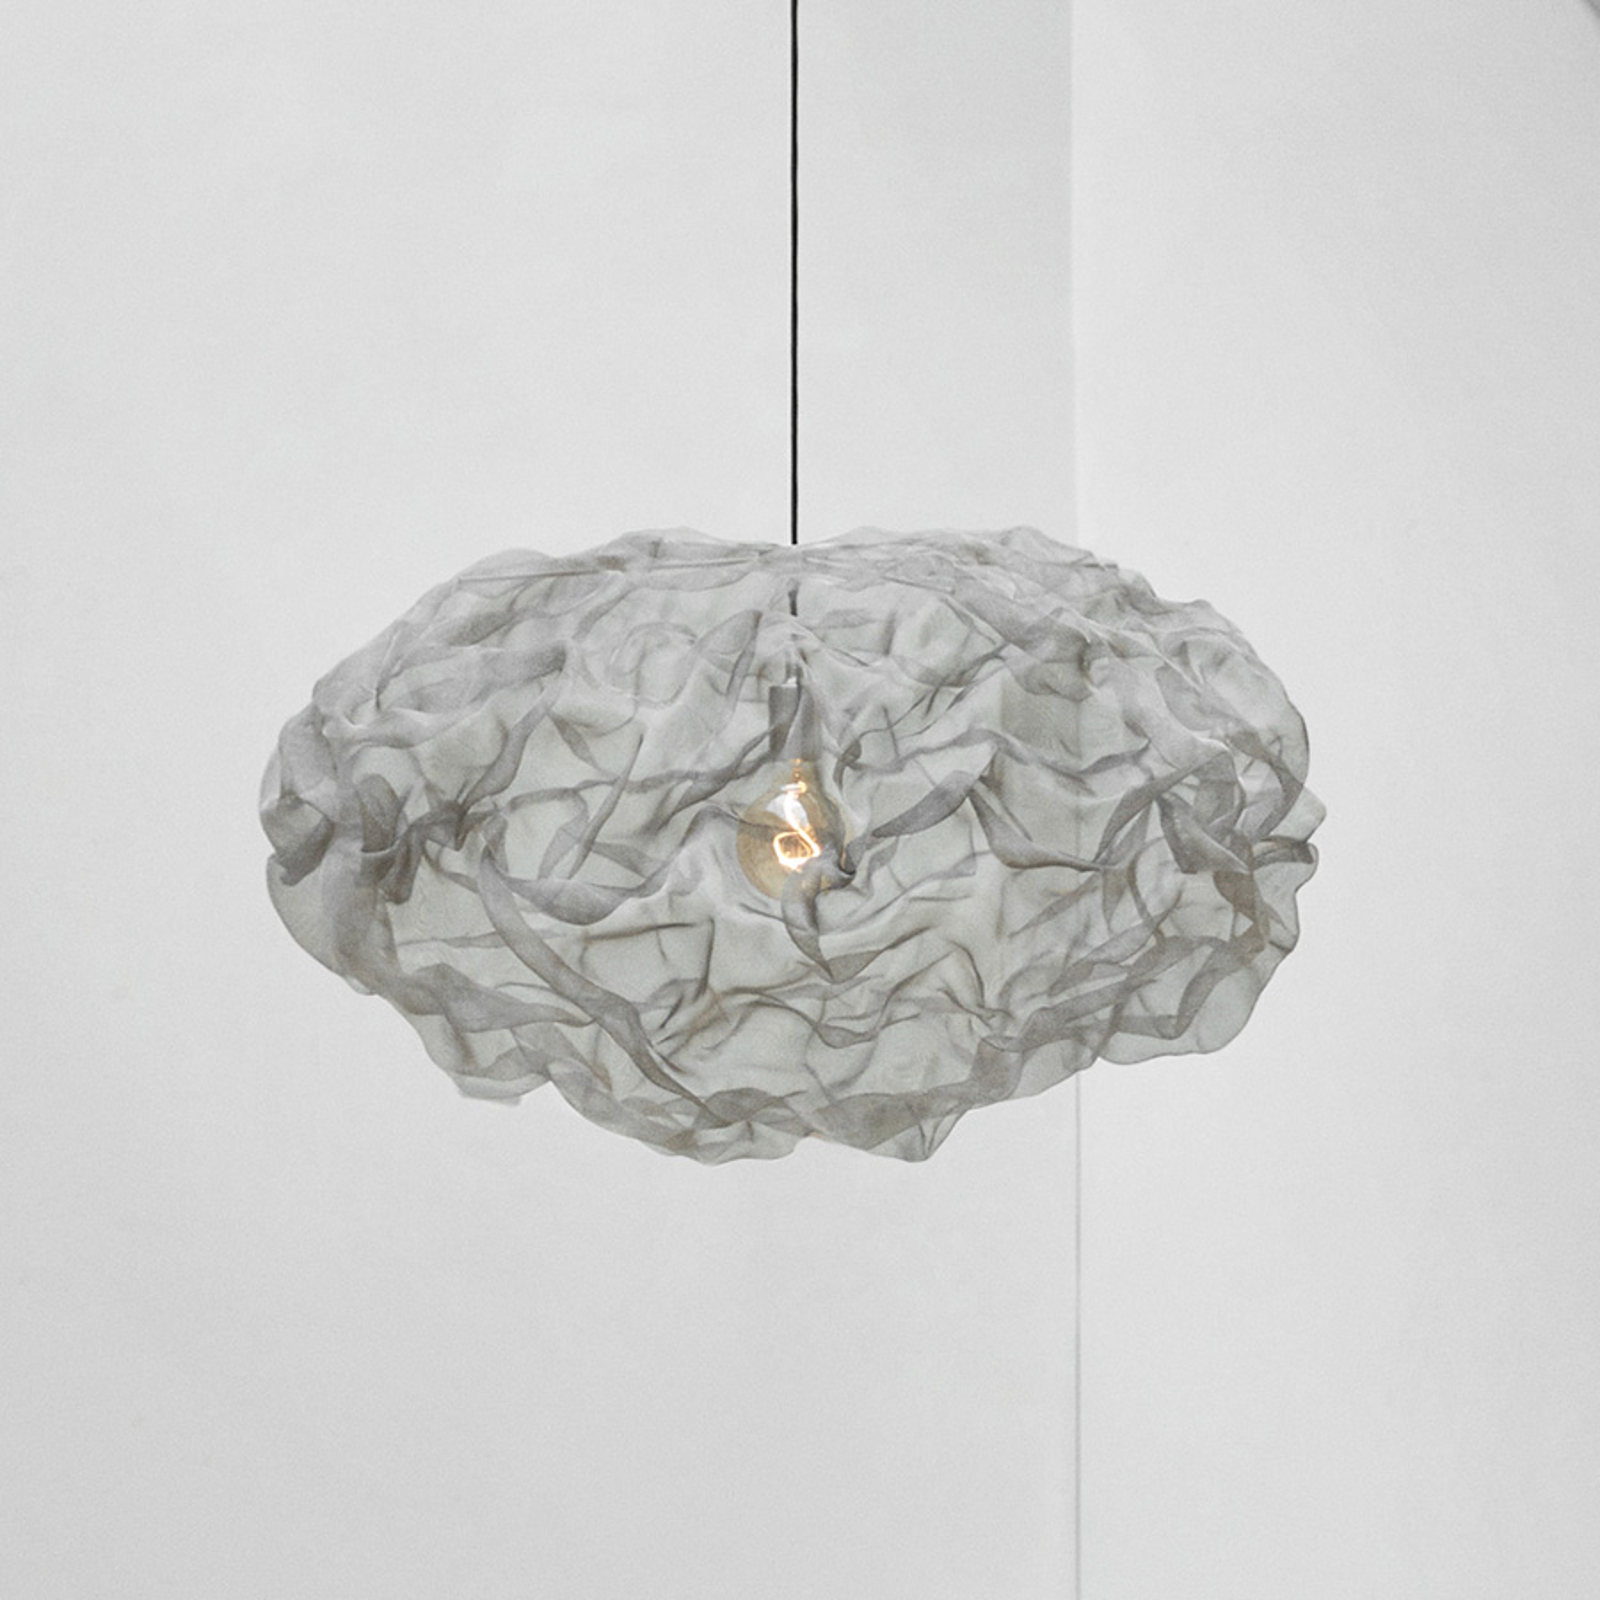 Northern Heat hanglamp, staal, Ø 55cm